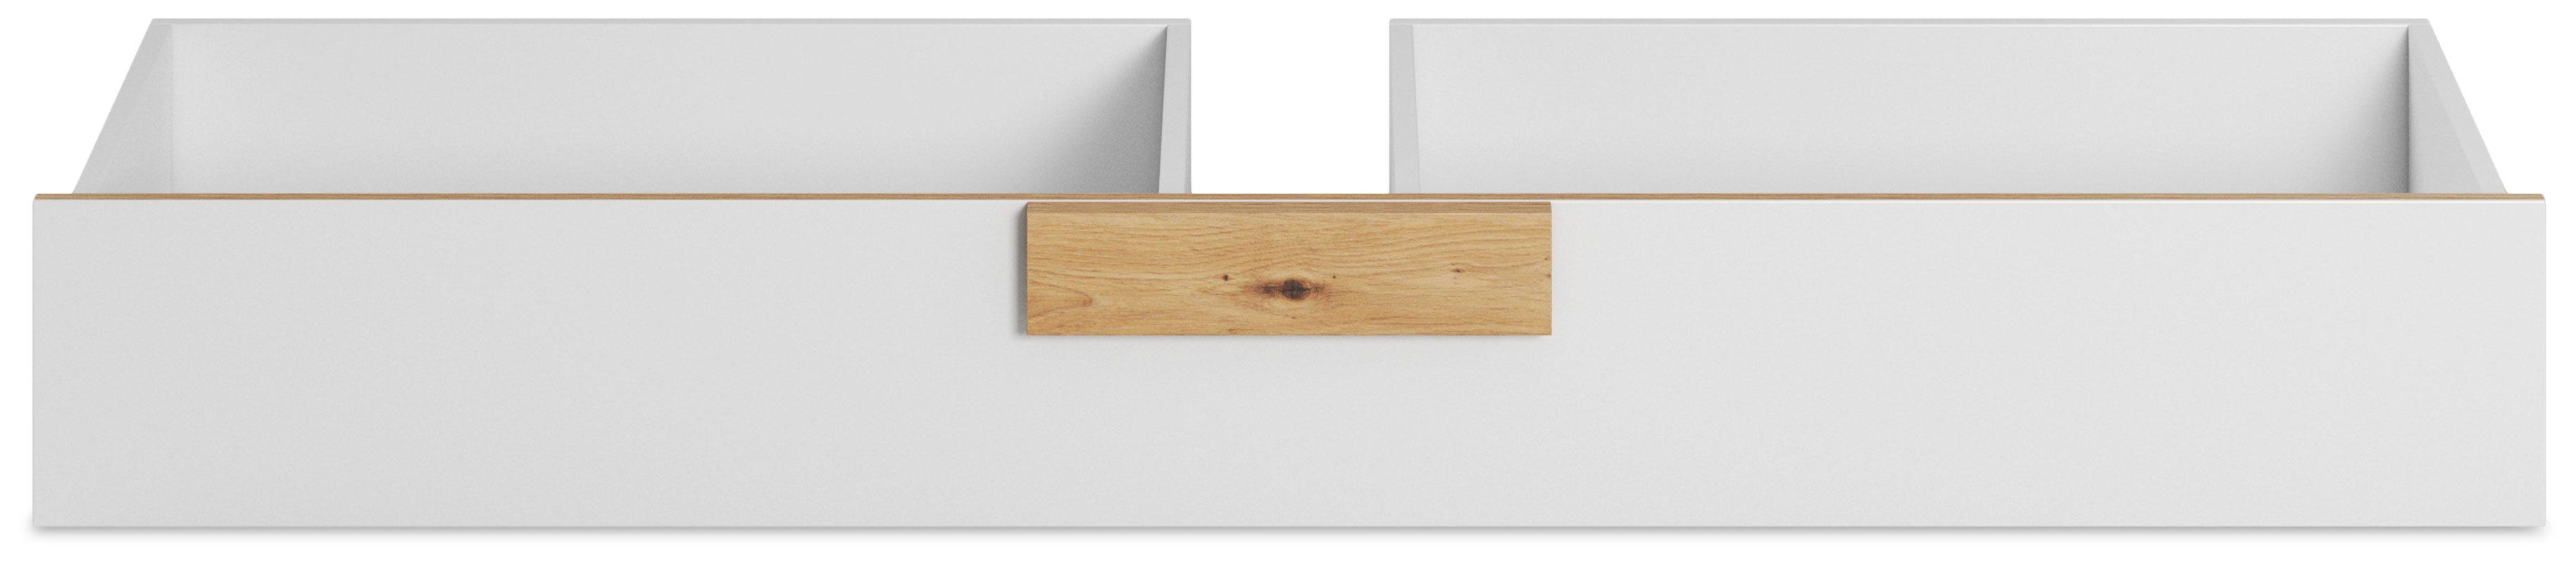 szuflada imoss lbll01  2